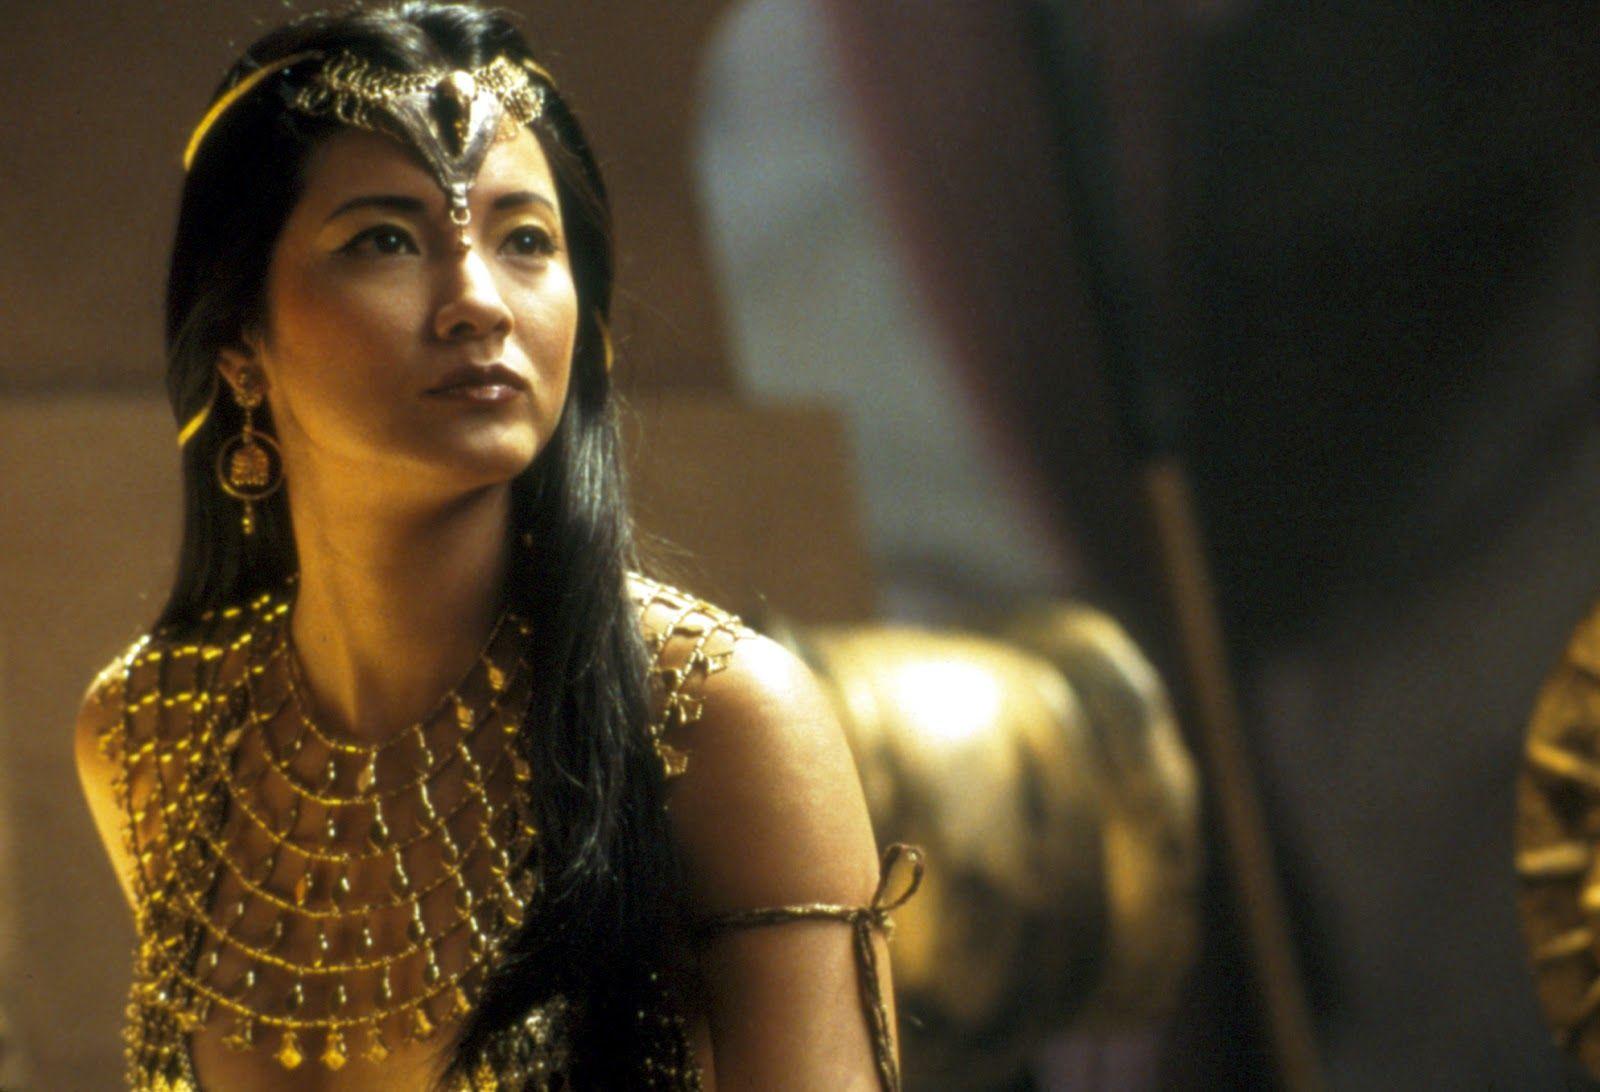 The Scorpion King Kelly Hu As Cassandra Filmes Fotos Modelos